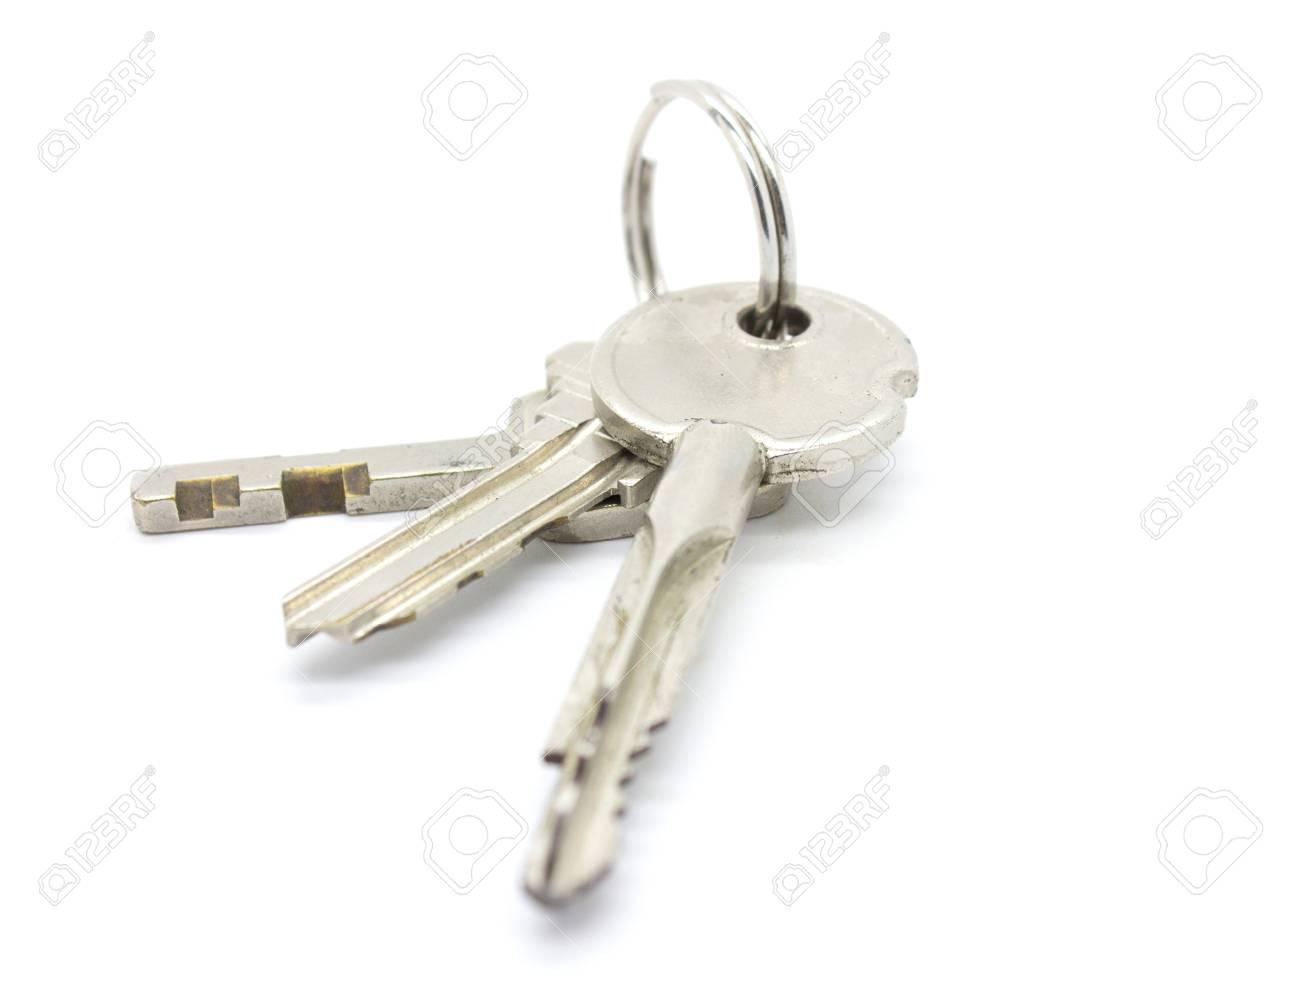 door keys on white background Stock Photo - 26313460